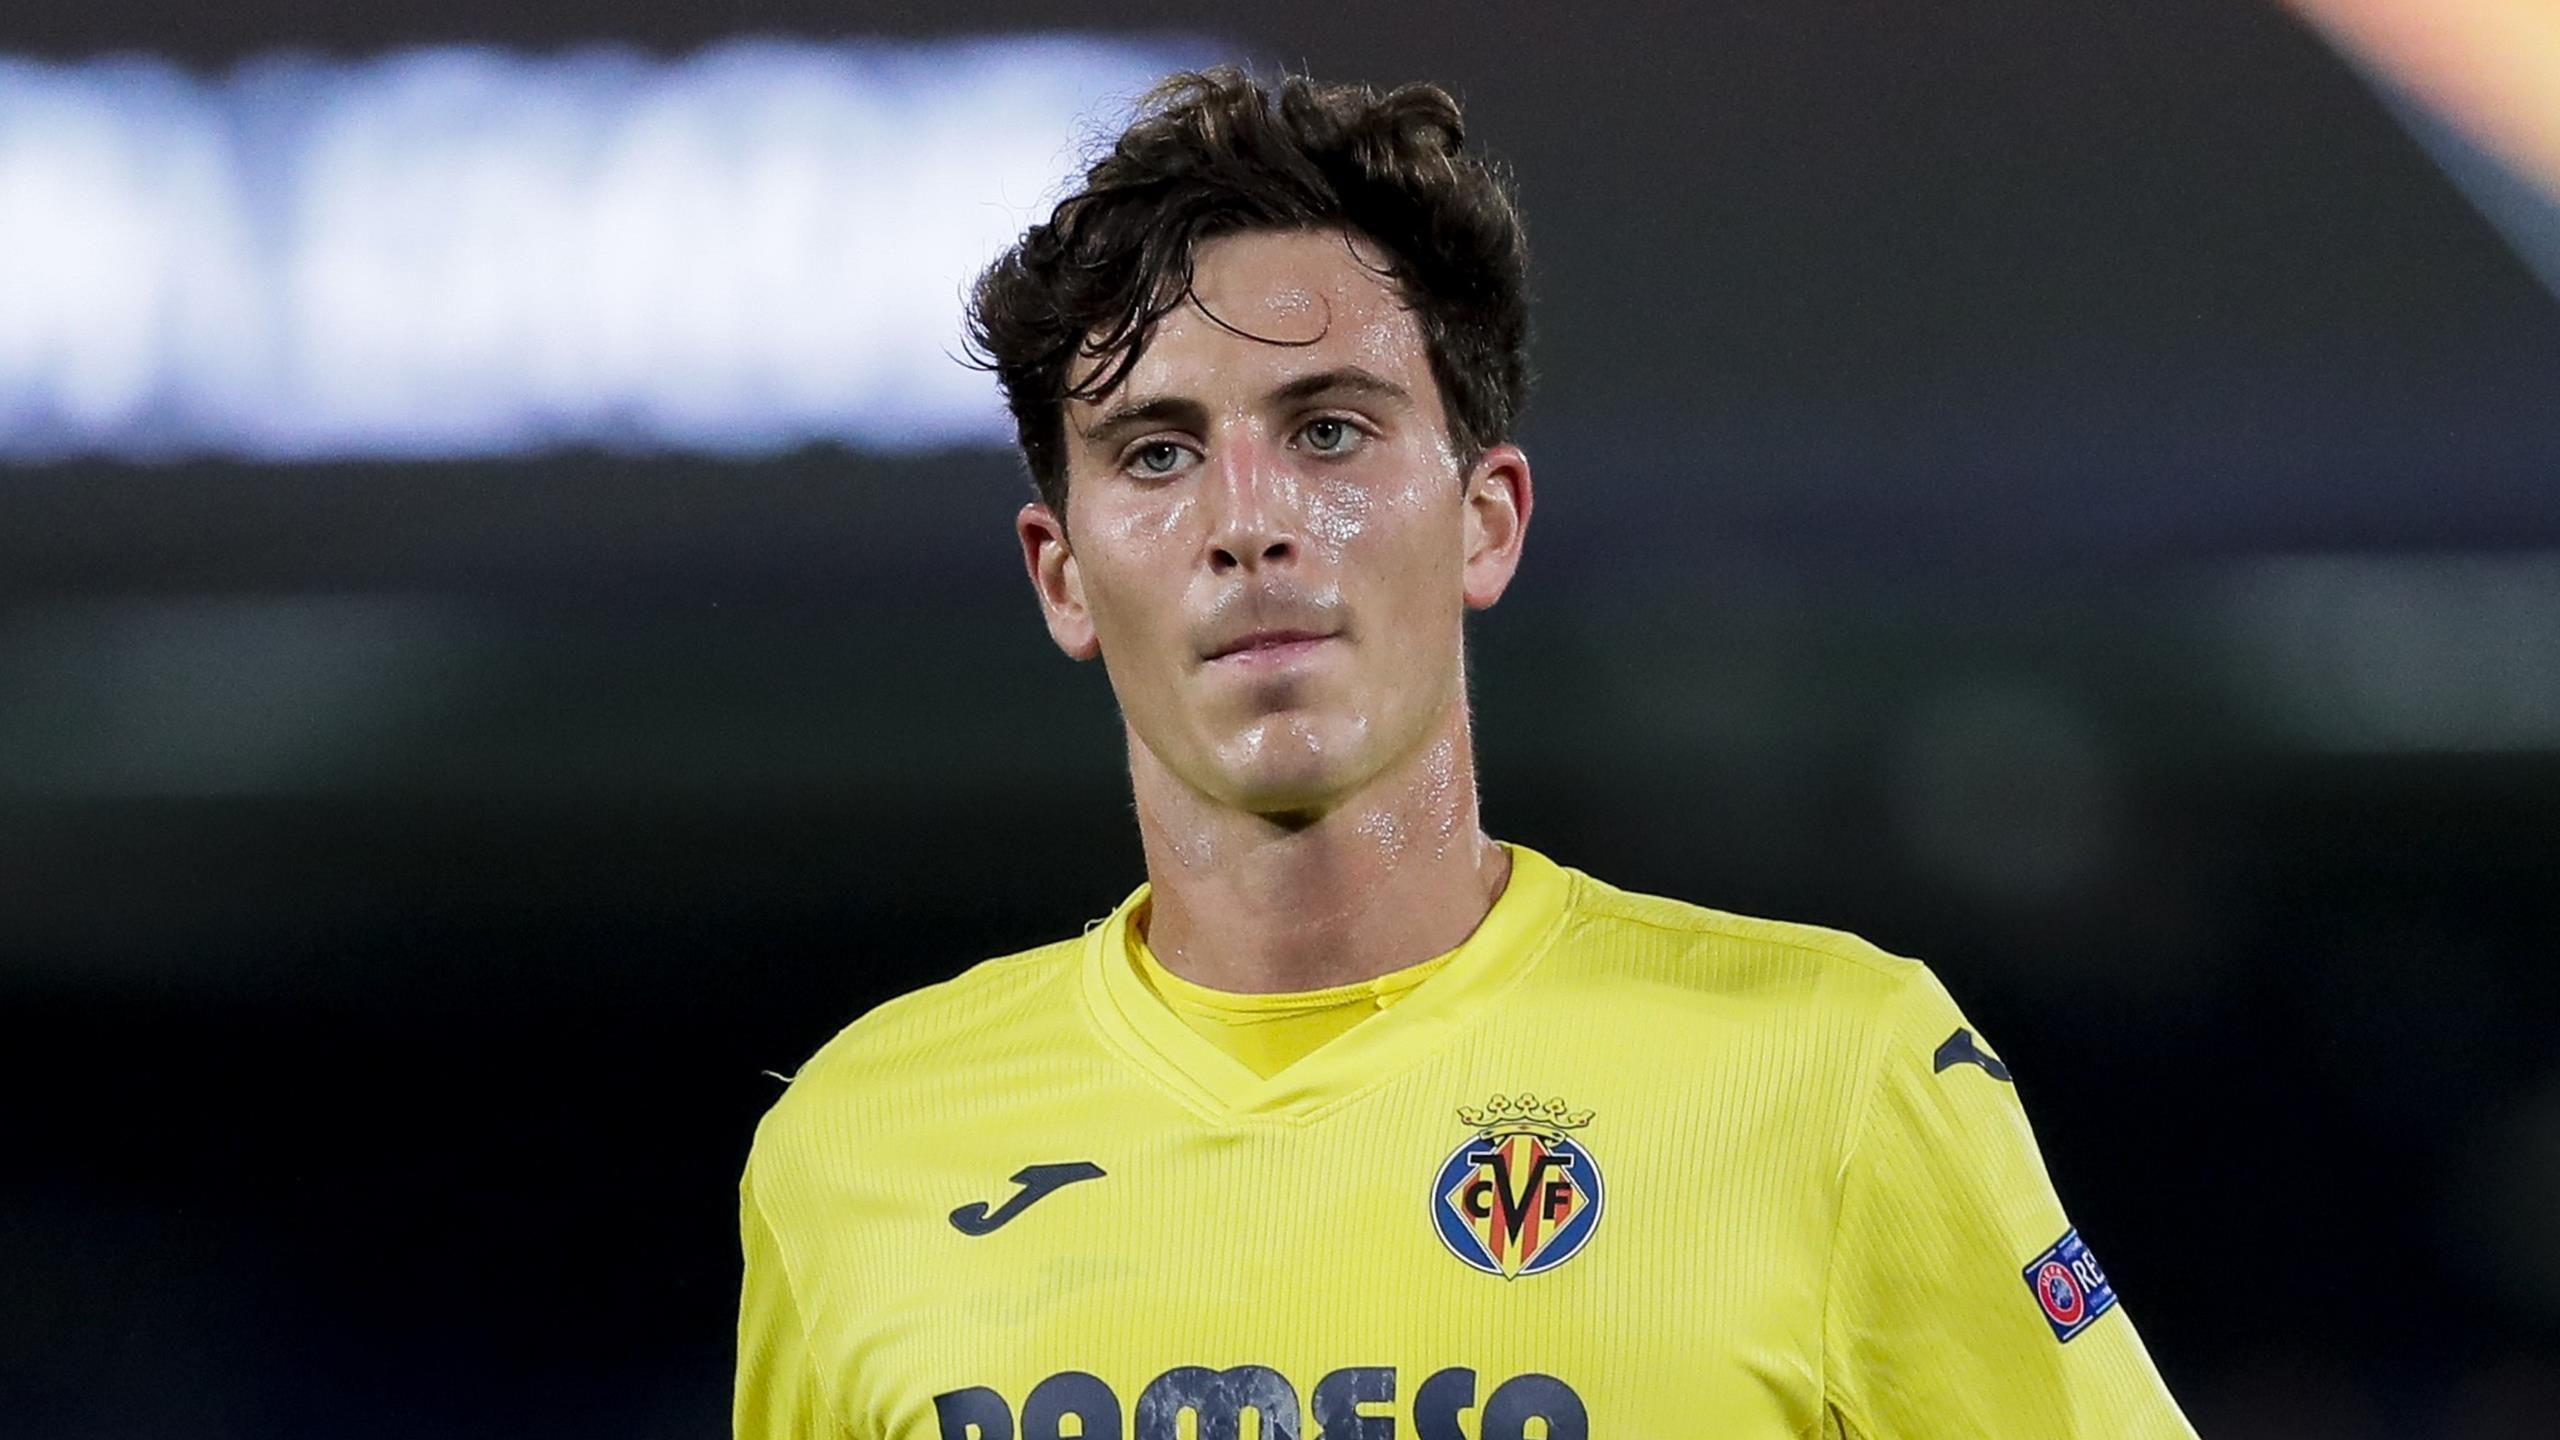 Utd Summer 2022 Calendar.Transfers Manchester United Contact Villarreal S Pau Torres Over 50m Summer Move Paper Round Eurosport